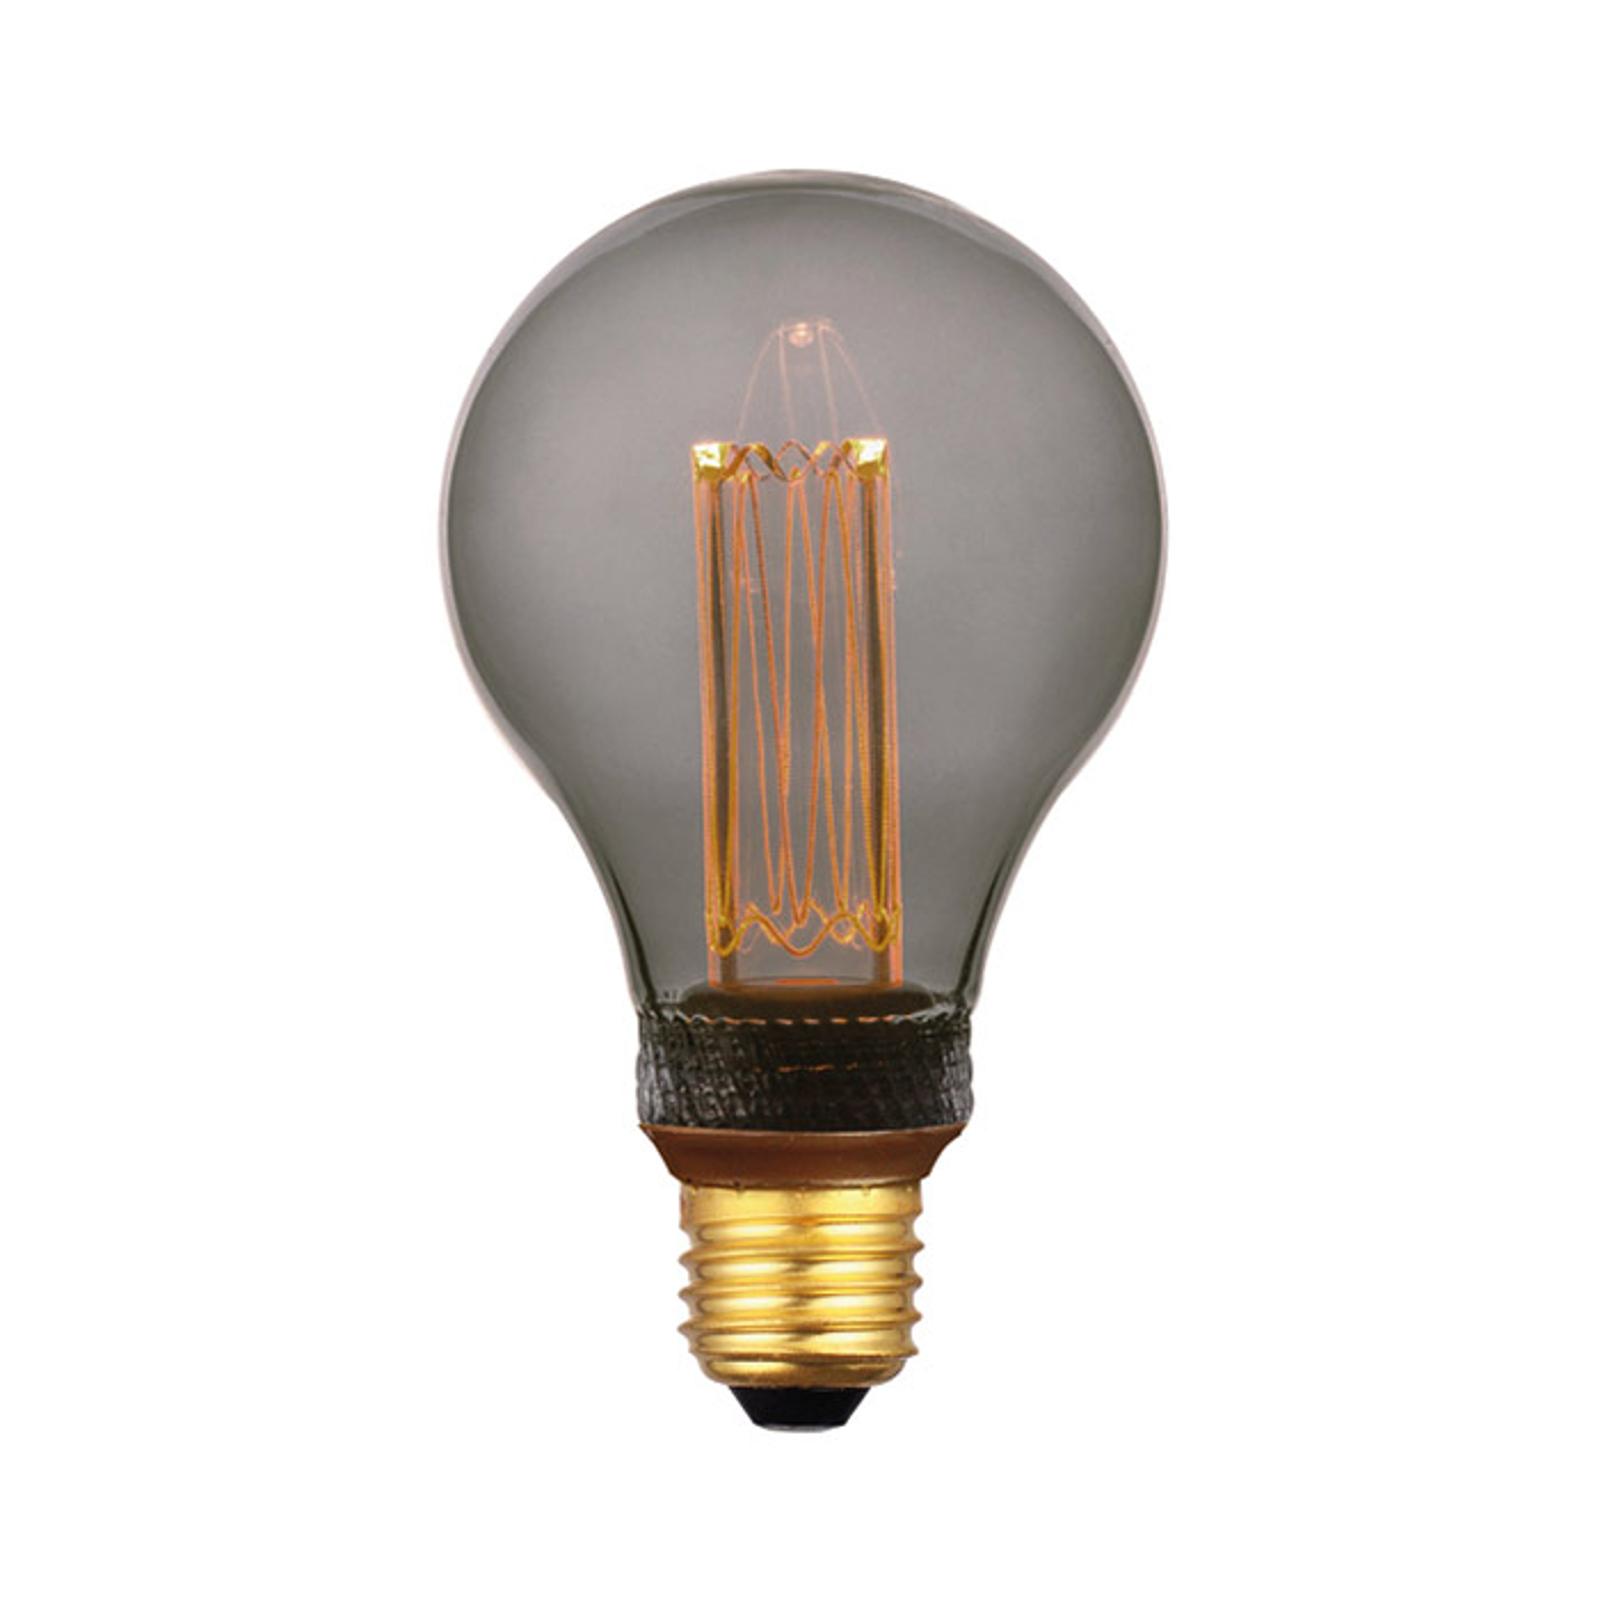 LED-Lampe E27 5W, warmweiß, 3-Step-dim, smoke 14cm